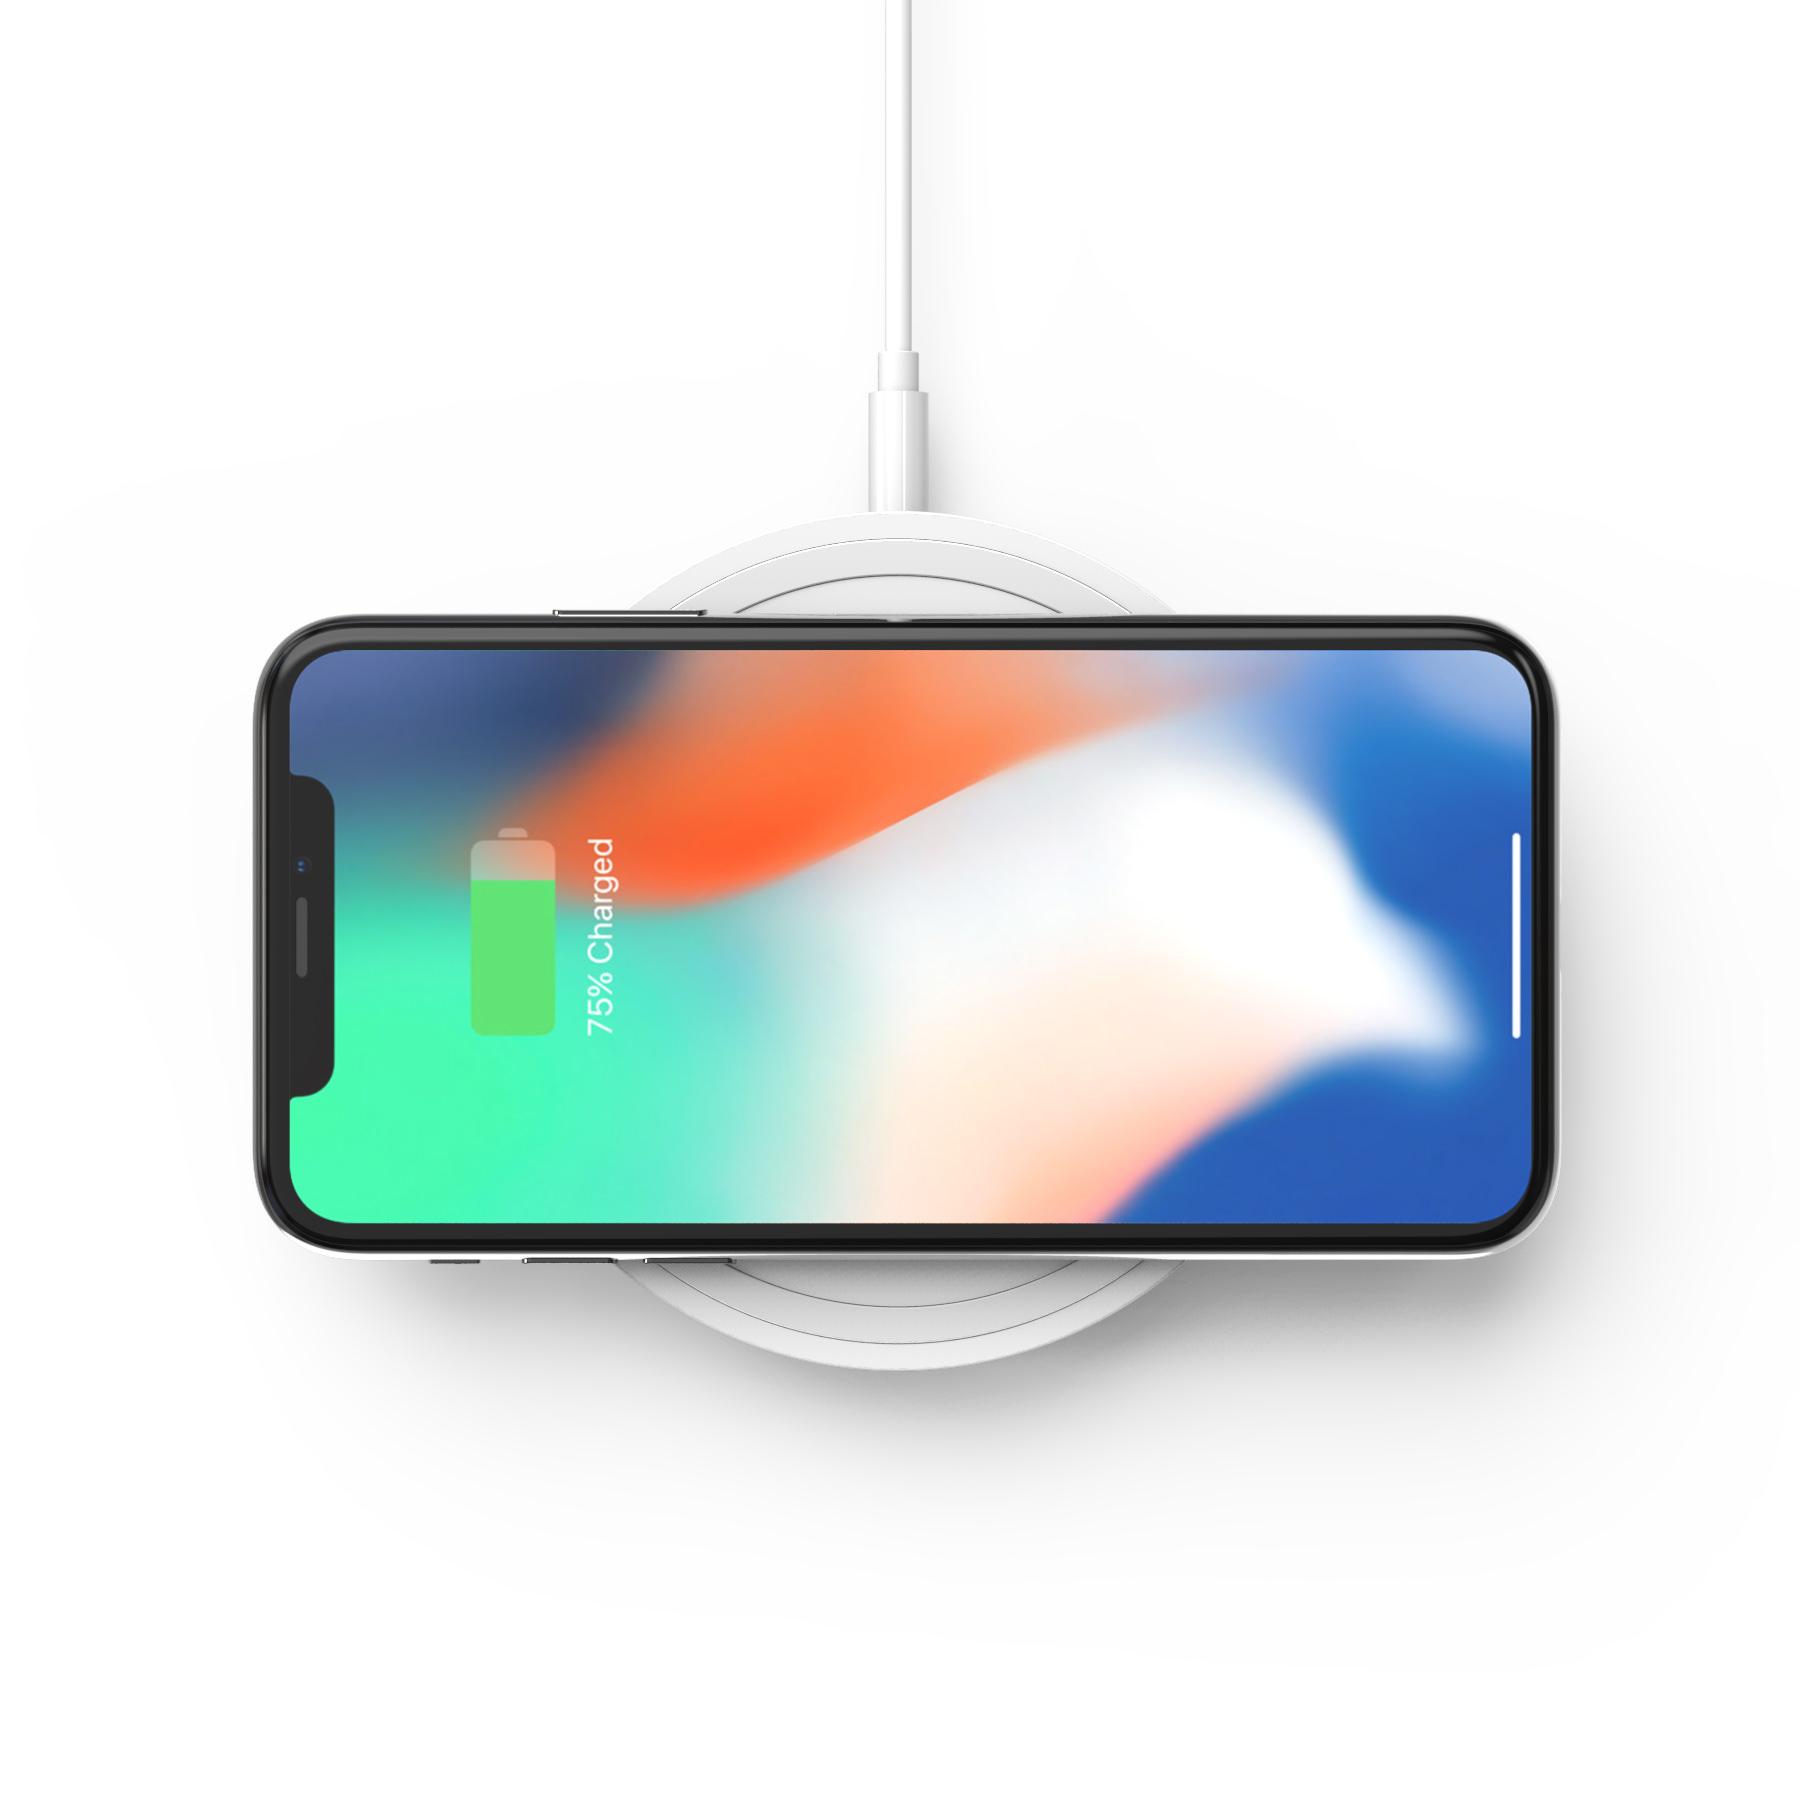 Bold_Charging_Pad_iPhone_2.jpg